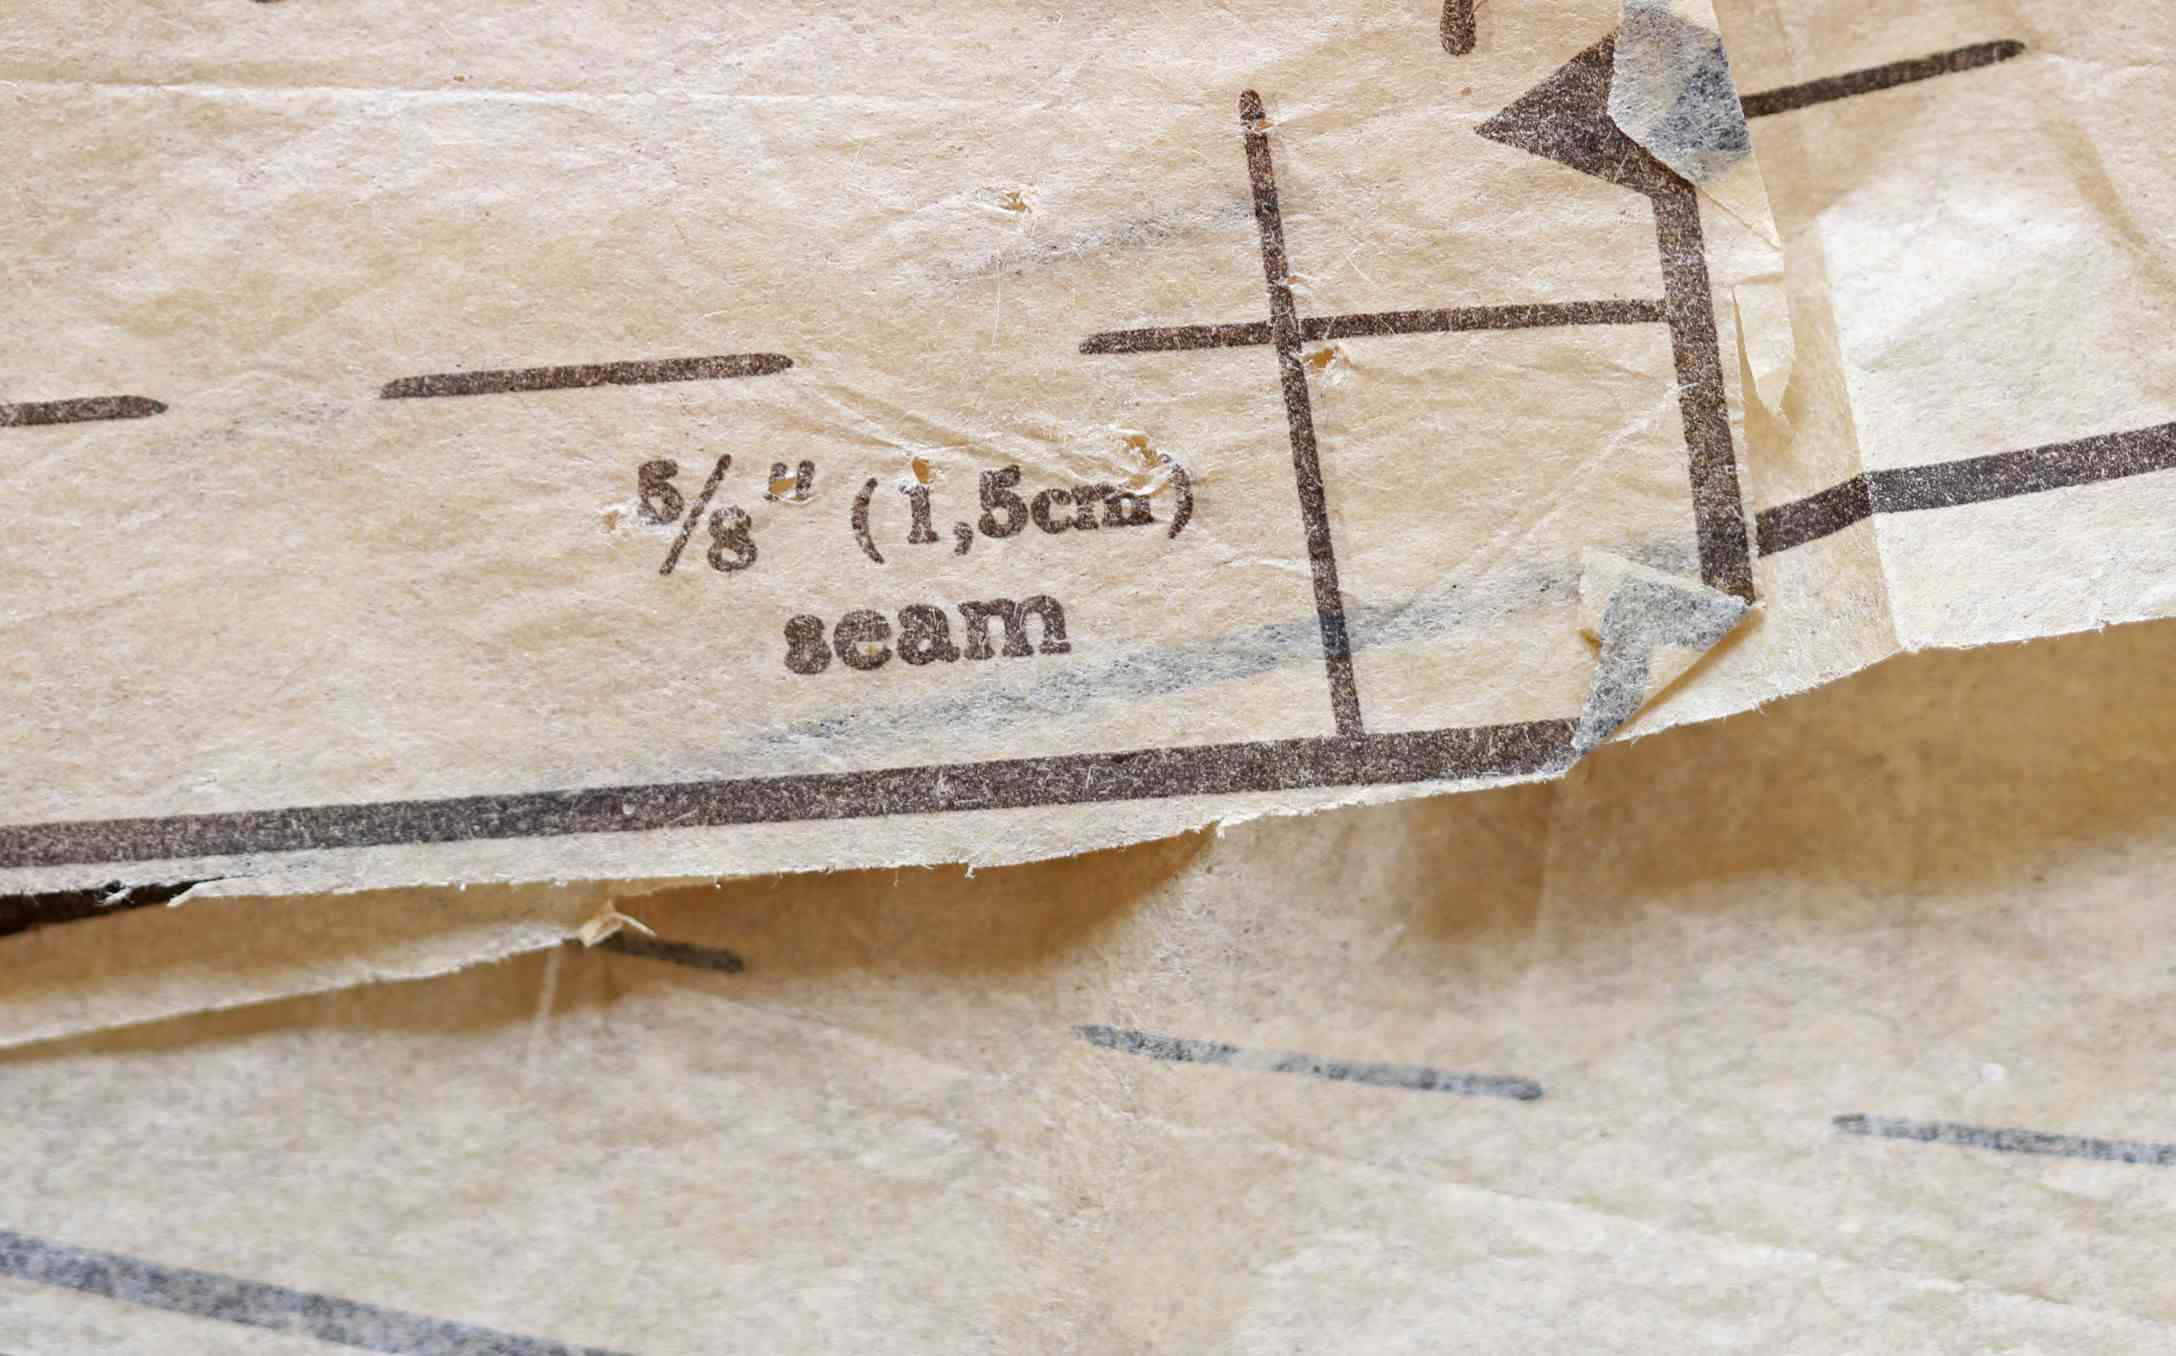 Seam pattern